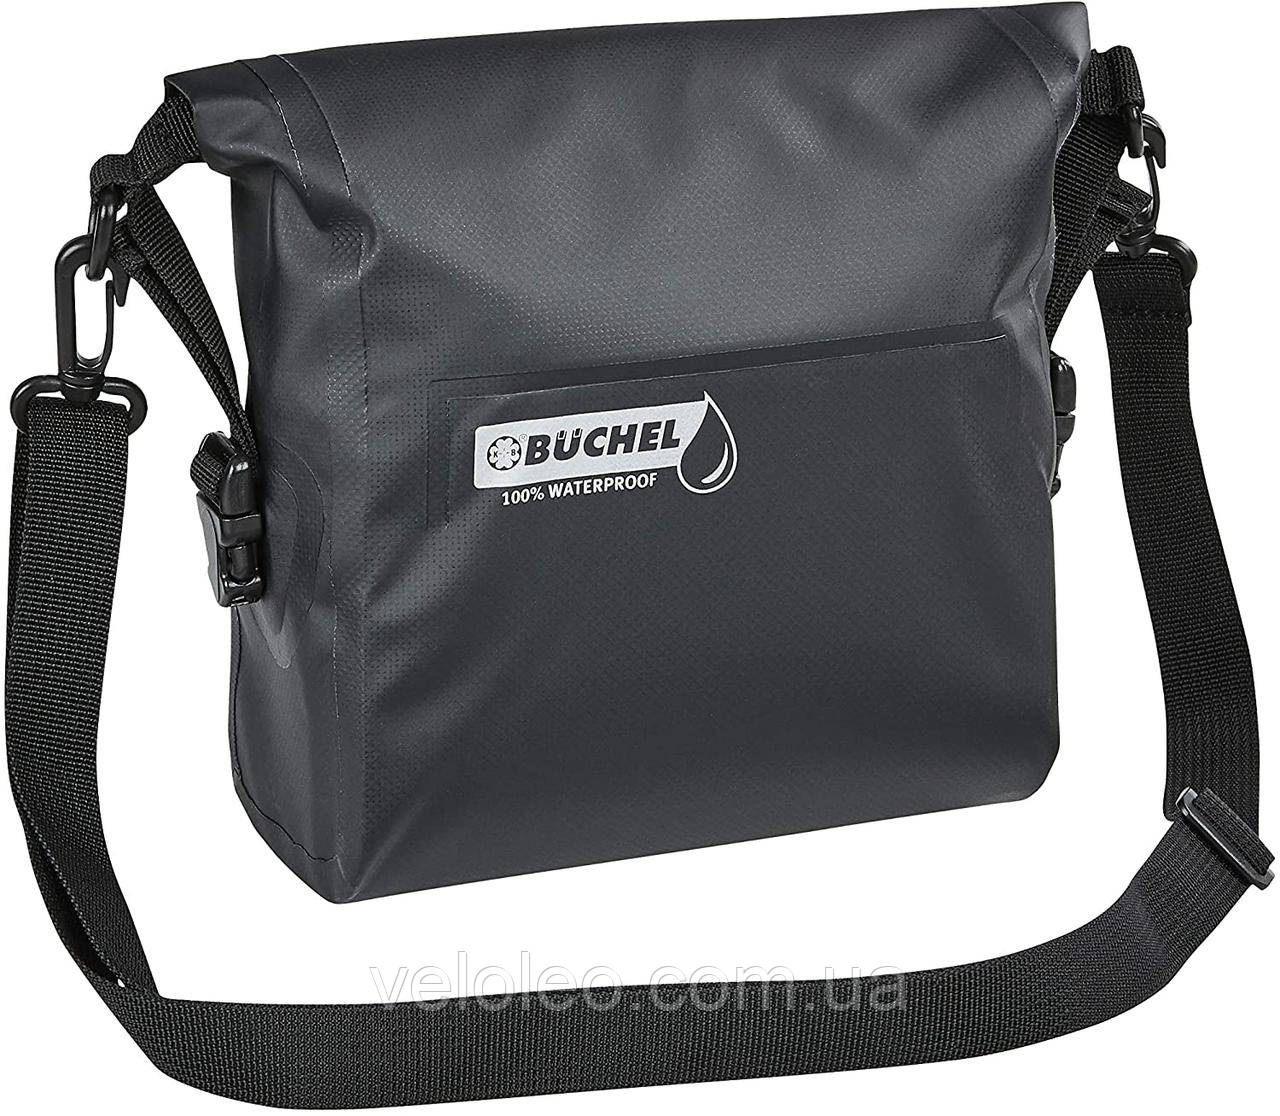 Сумка на кермо Buchel 100% waterproof 26 x 14,5 x 25 cm